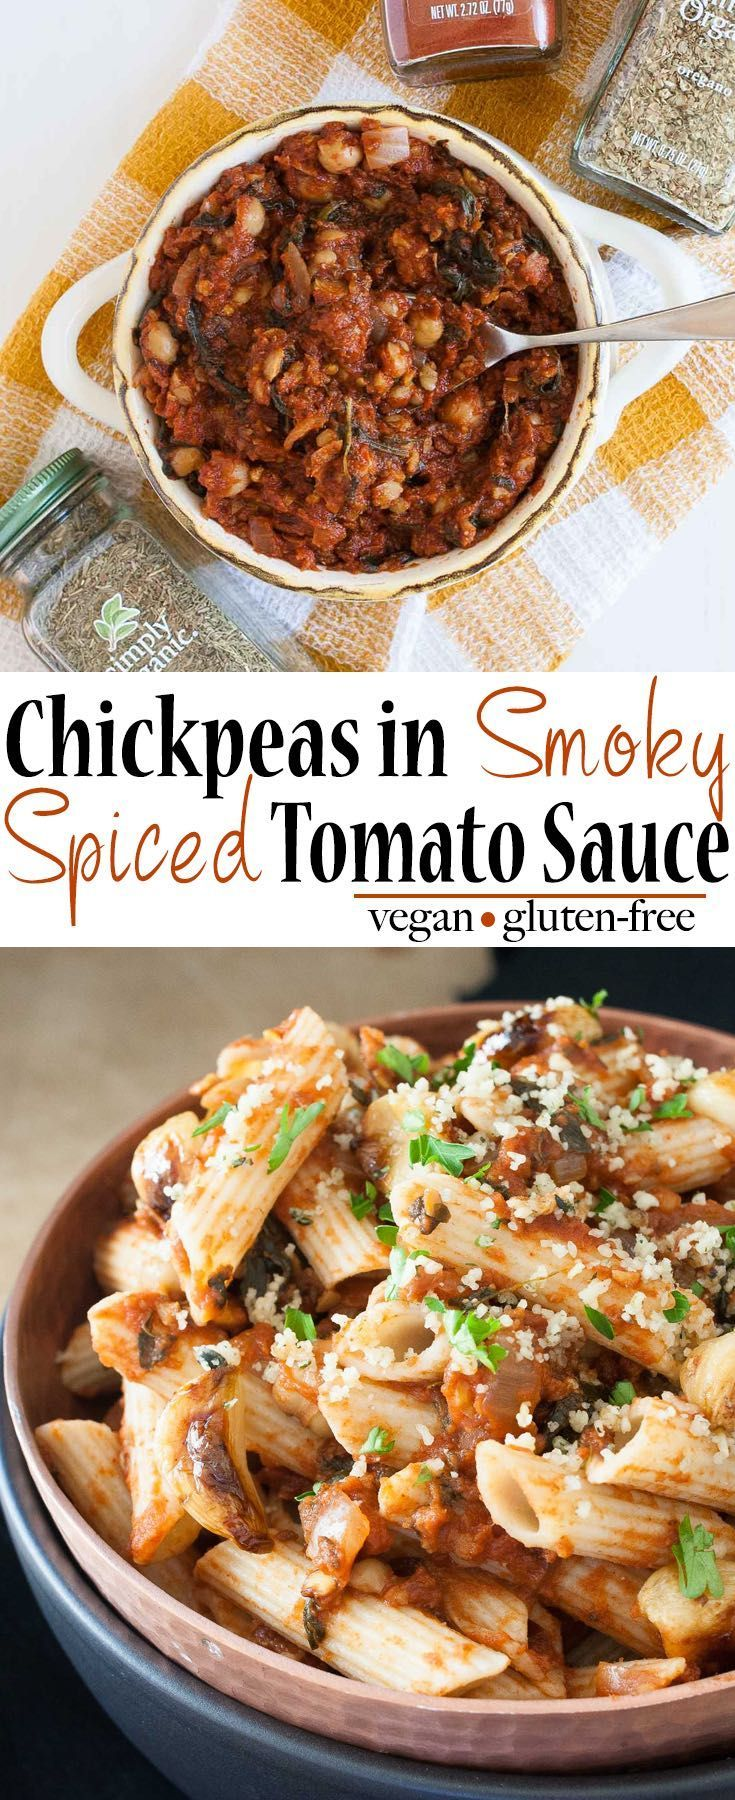 Chickpeas in Smoky Spiced Tomato Sauce   www.veggiesdontbite.com